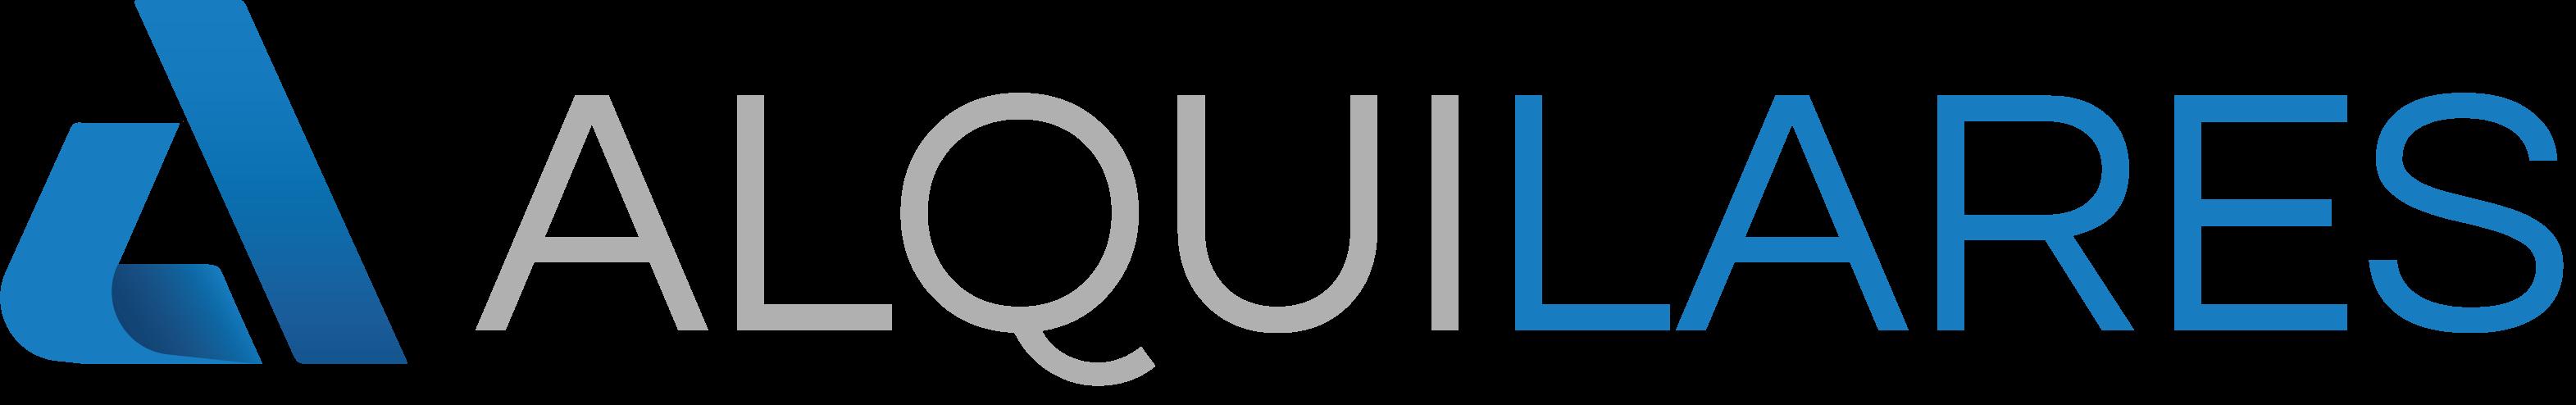 Aquilares